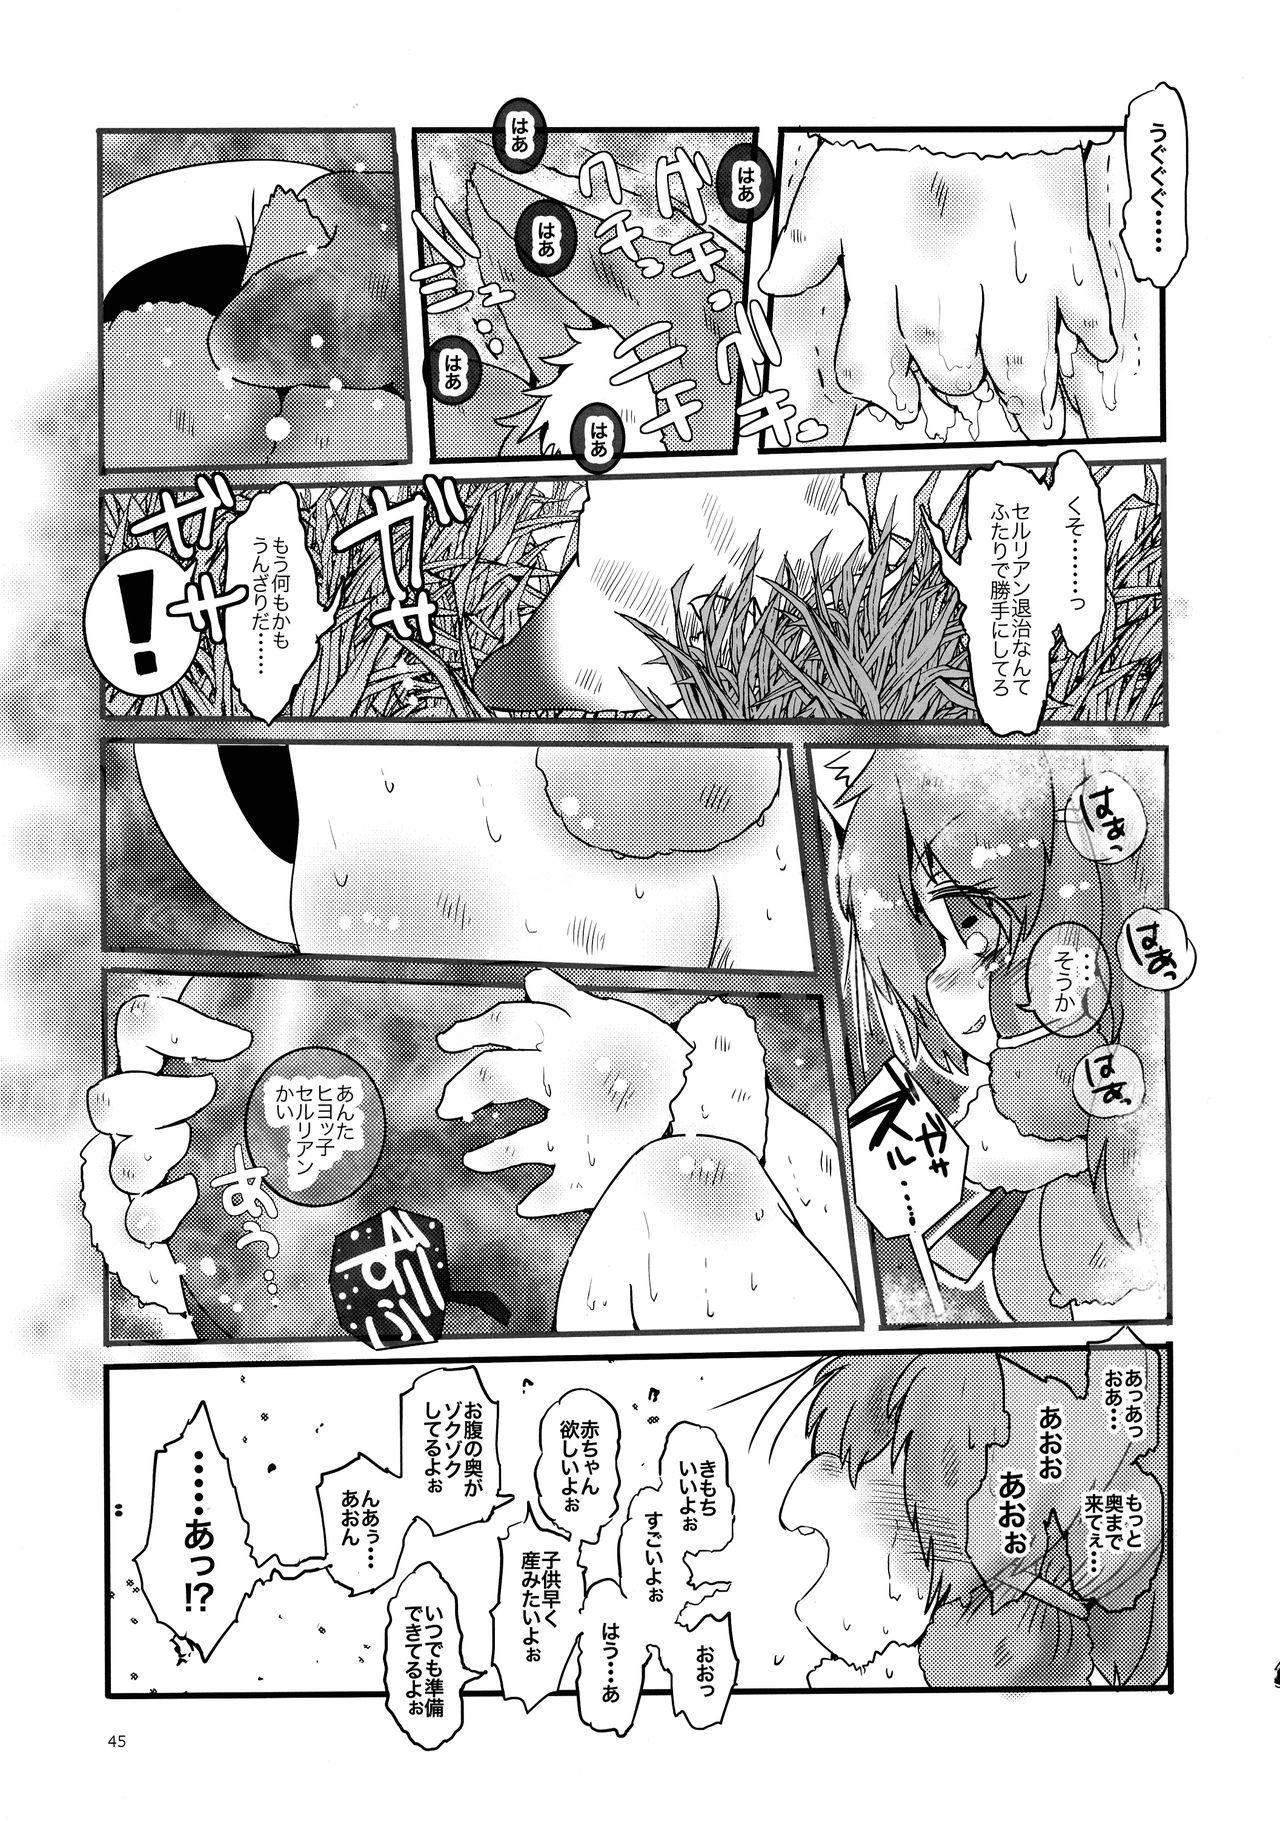 Fuwaaa! Irasshaai! Ura Iyashi no Alpaca-san Goudou 44